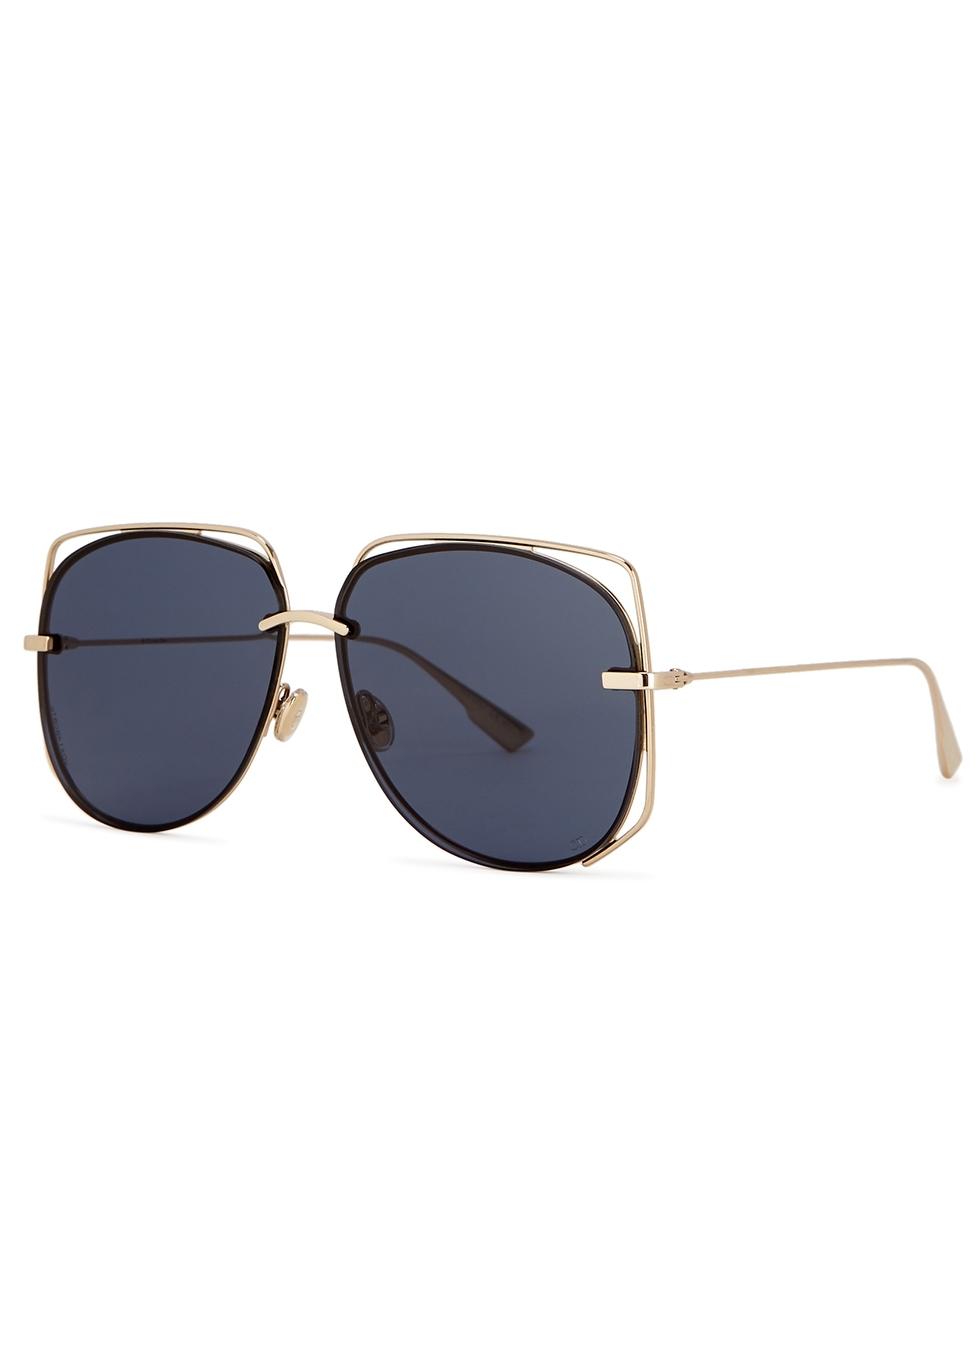 acfc6d861e610 Women s Designer Sunglasses and Eyewear - Harvey Nichols